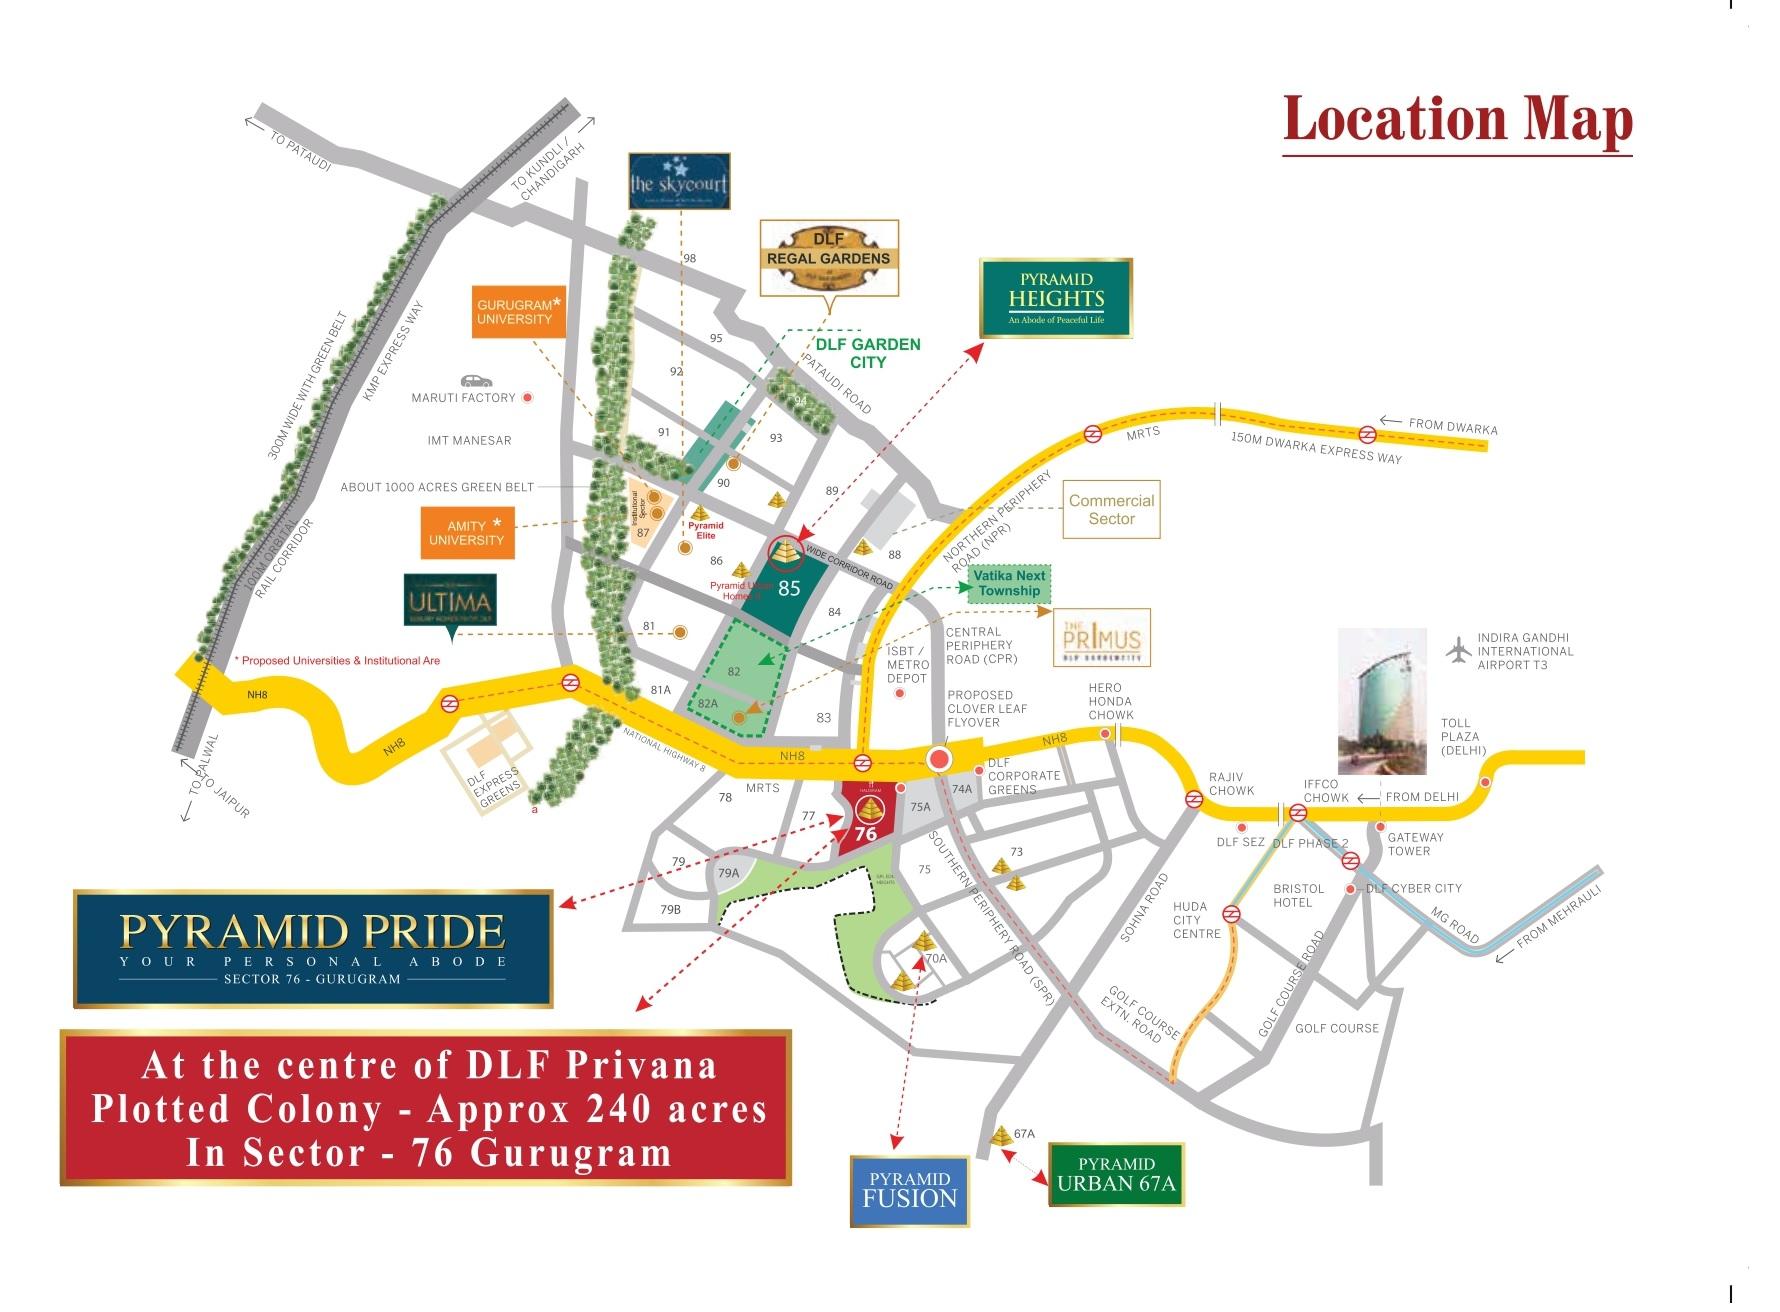 Location Map Pyramid Pride Sector 76 Gurugram